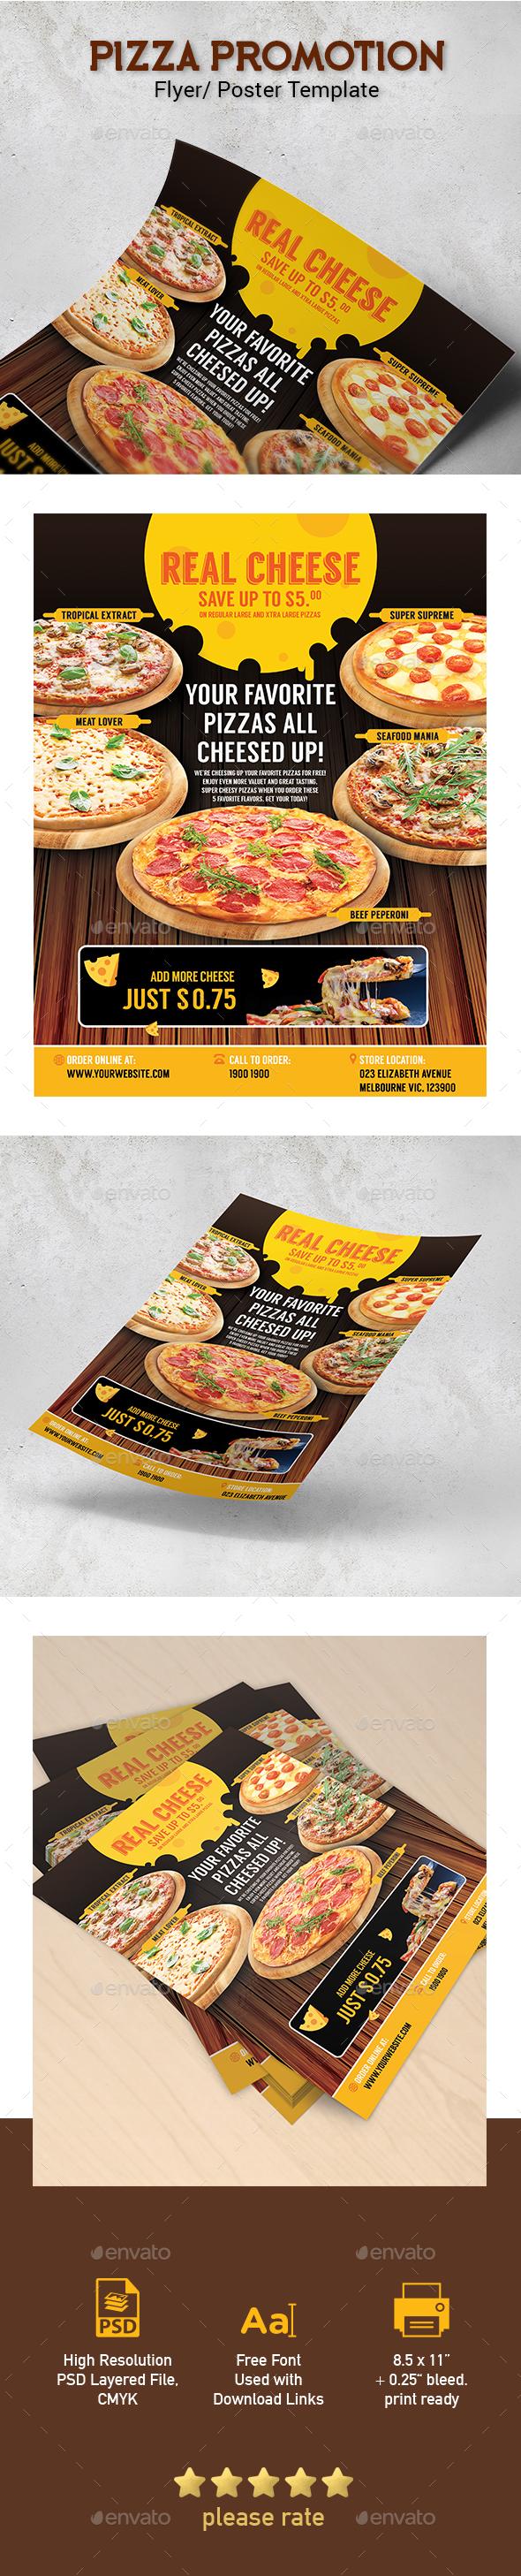 Pizza Menu Restaurant Promotion Template for Poster / Flyer - Restaurant Flyers